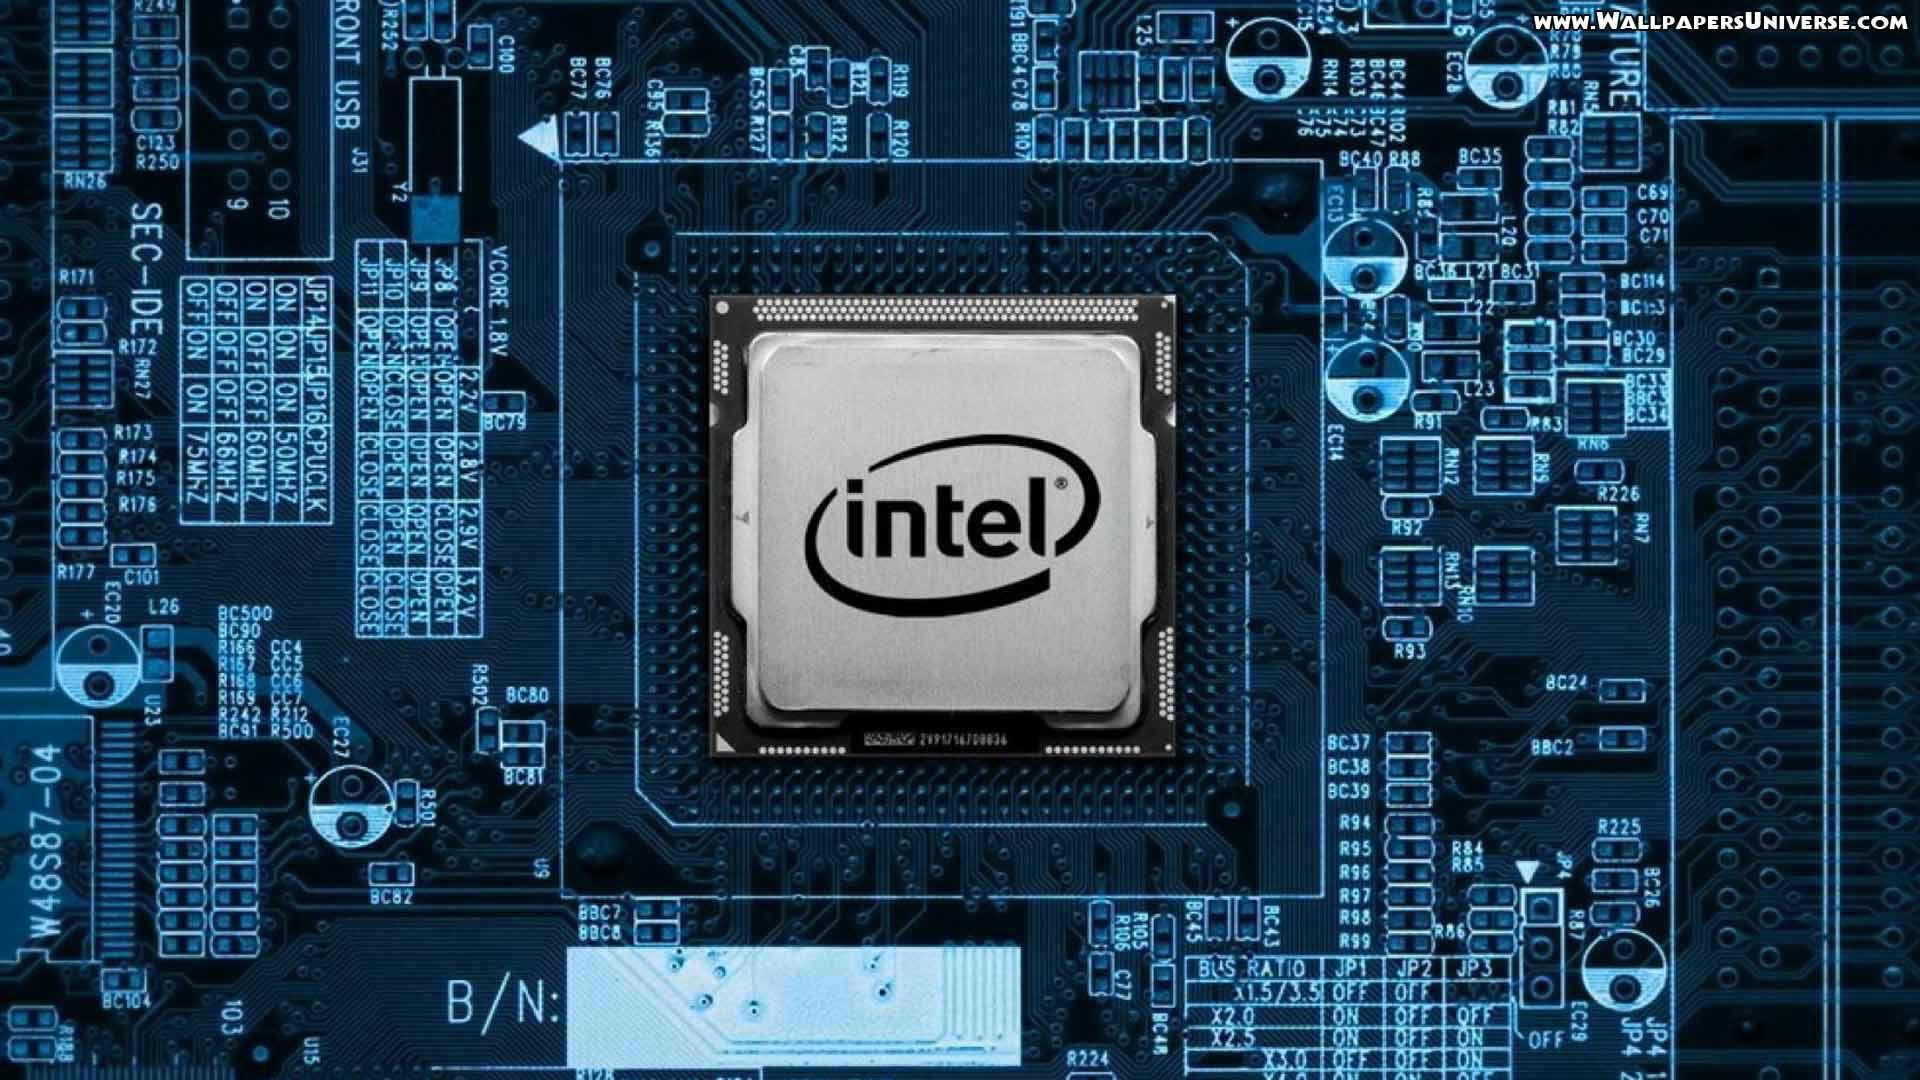 Intel Confirms Meltdown Spectre Updates Bug Causing System Reboots 1920x1080